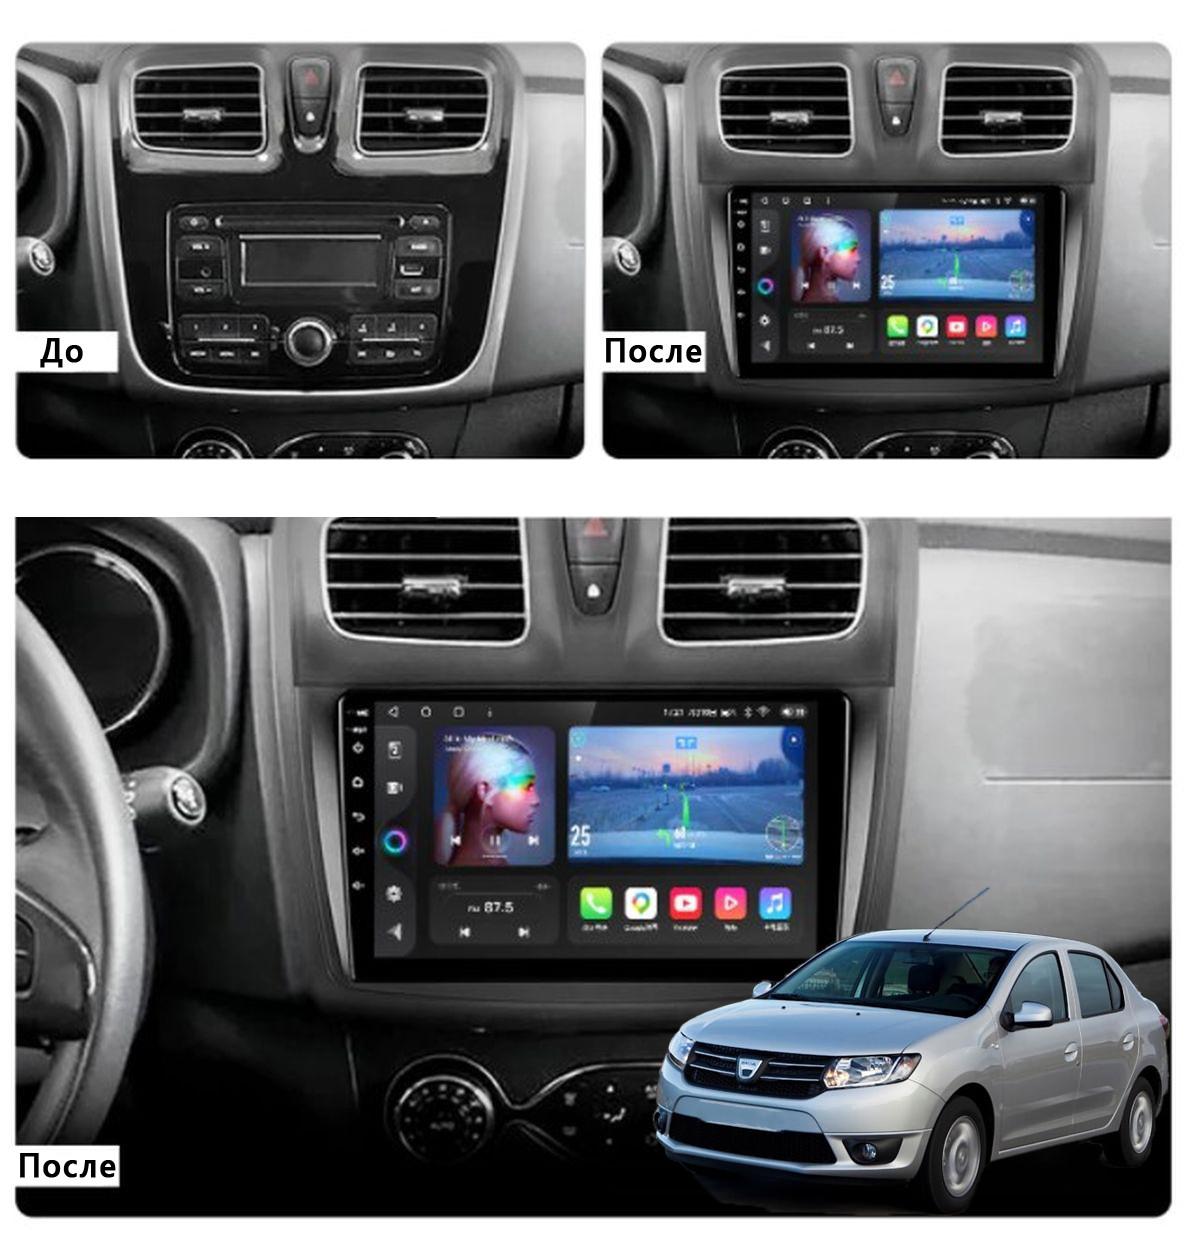 Штатная Android Магнитола на Dacia Logan 2014-2017, Renault Model 4G-solution + canbus (М-ДЛ-9-4Ж)